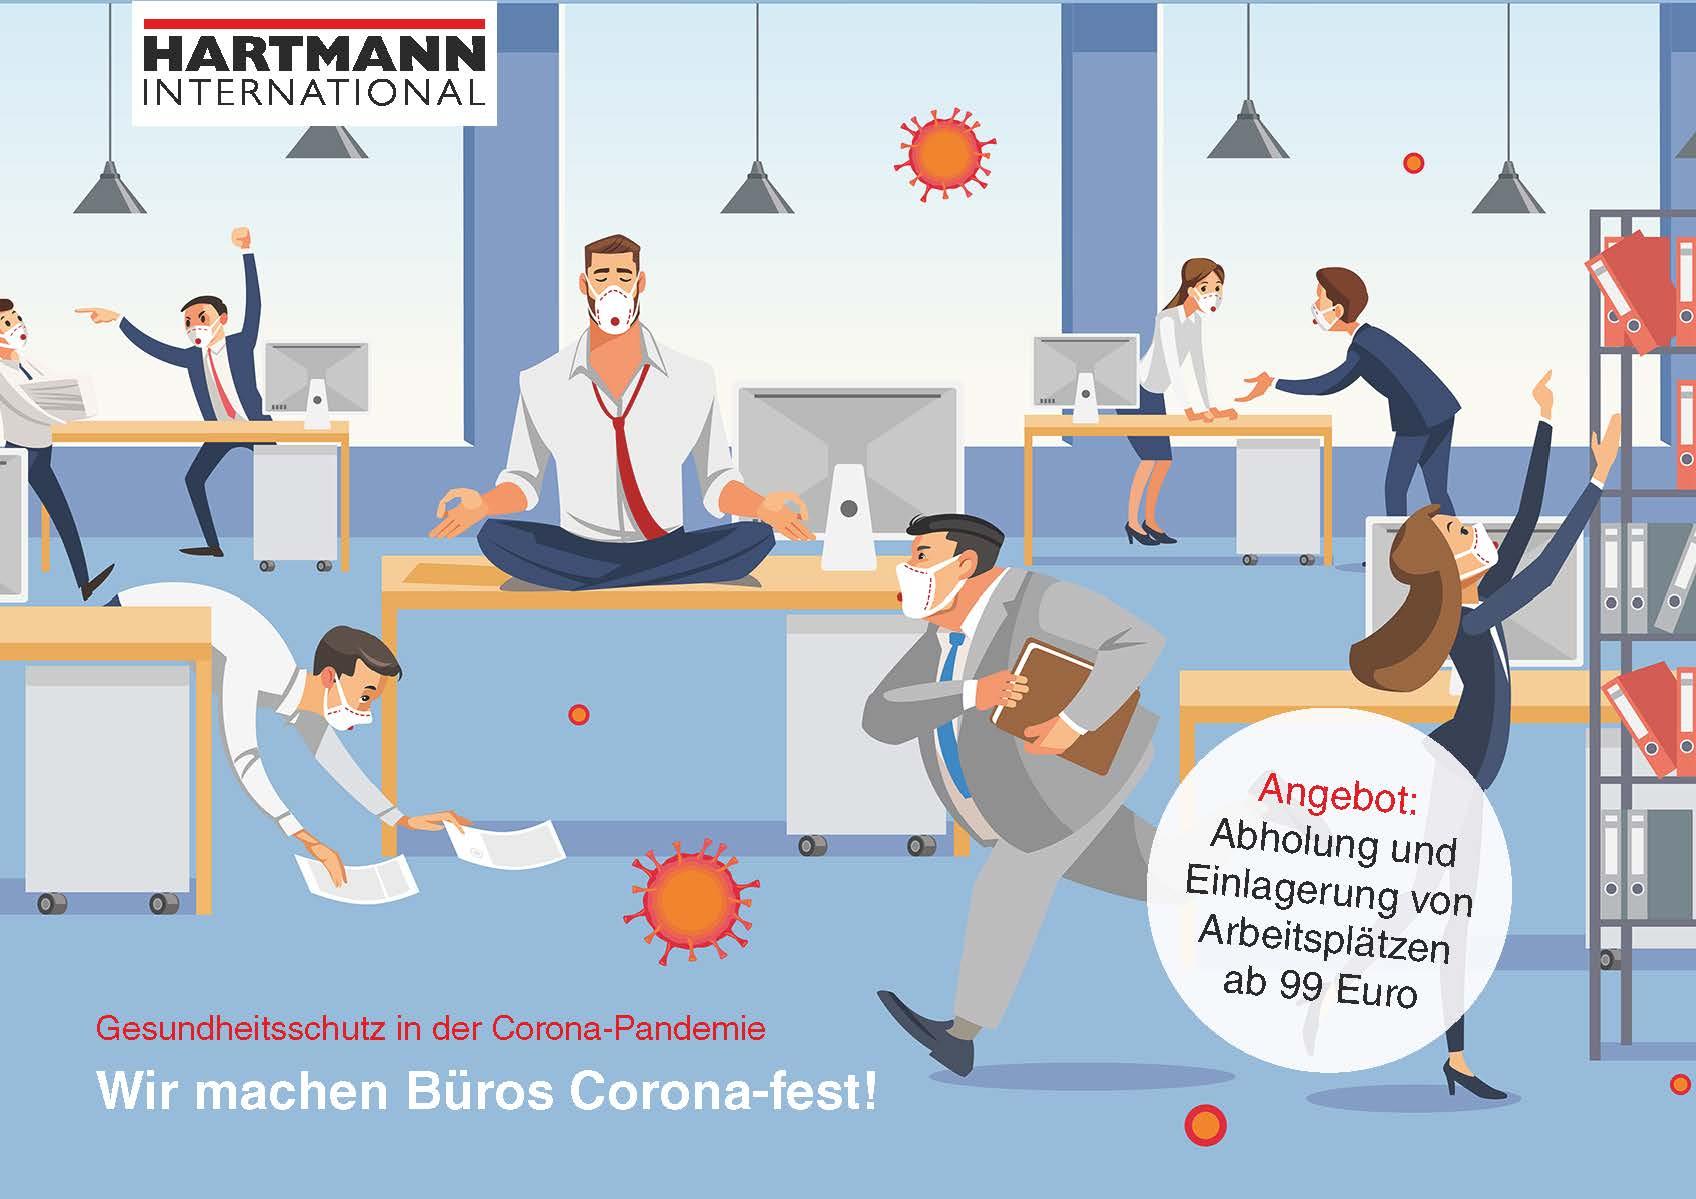 Hartmann_Büros Corona-fest_Seite_1